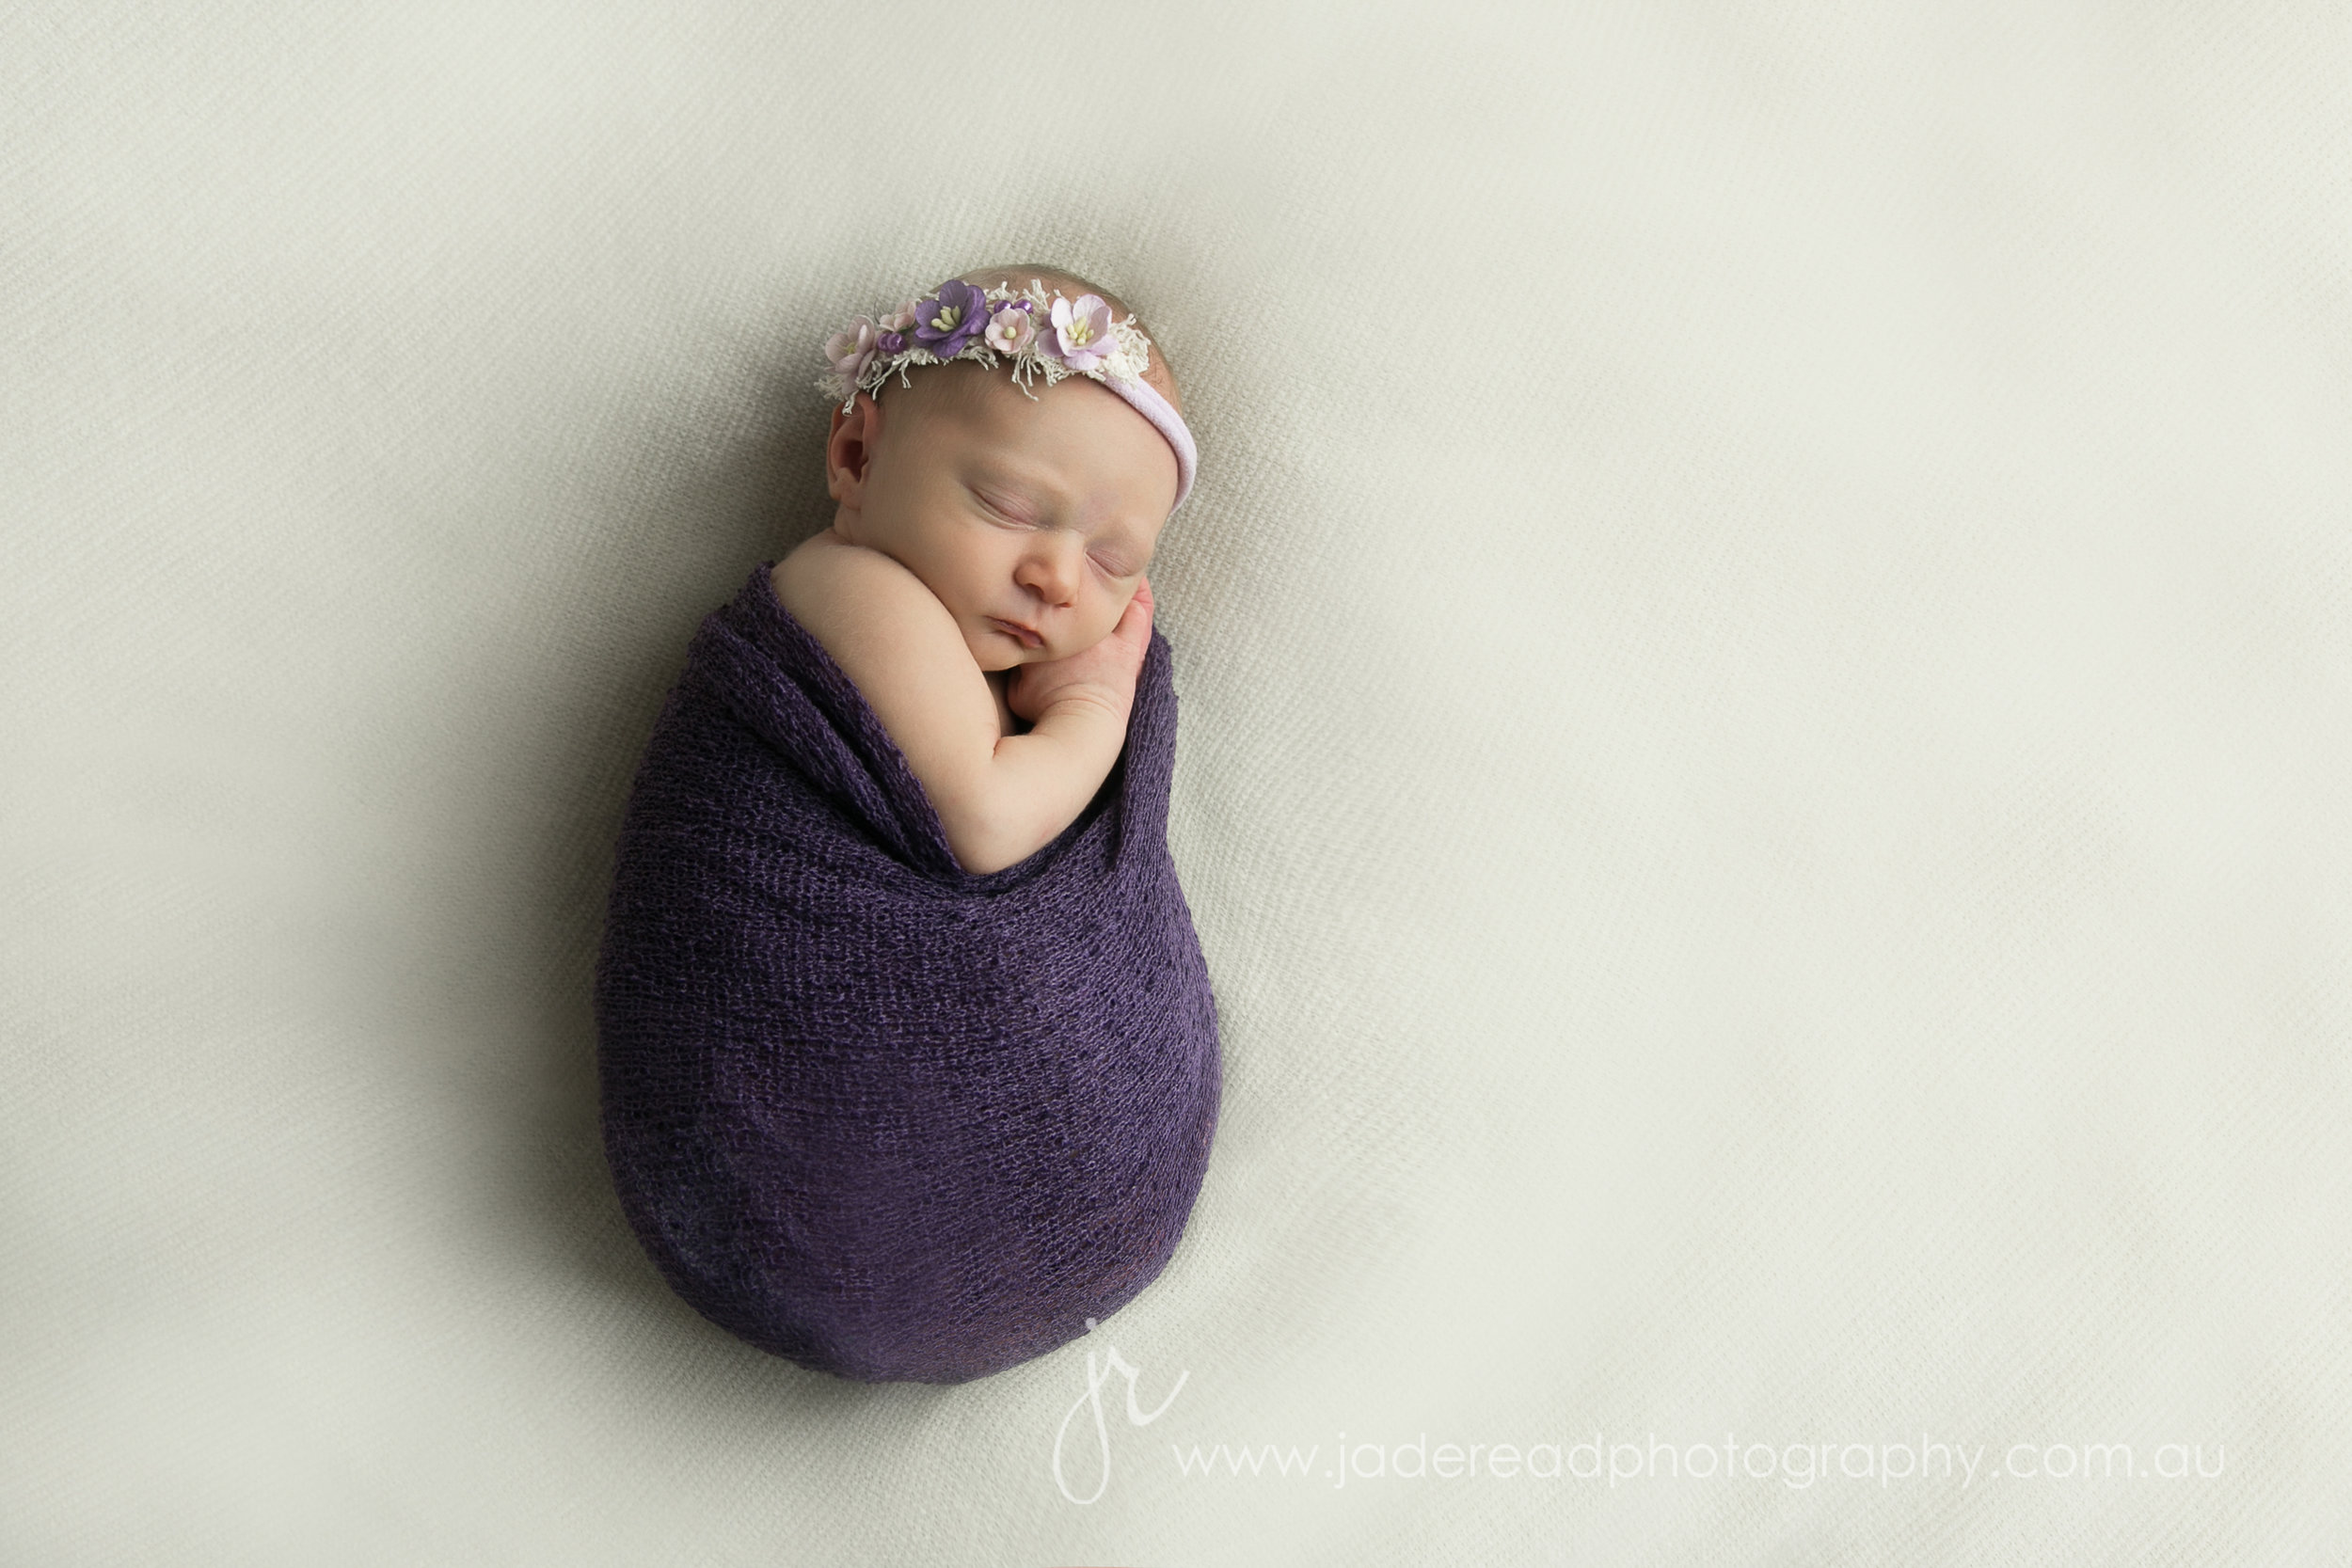 Newborn Photographer Gold Coast Baby Photography Upper Coomera Children's Photos Jade Read Photography